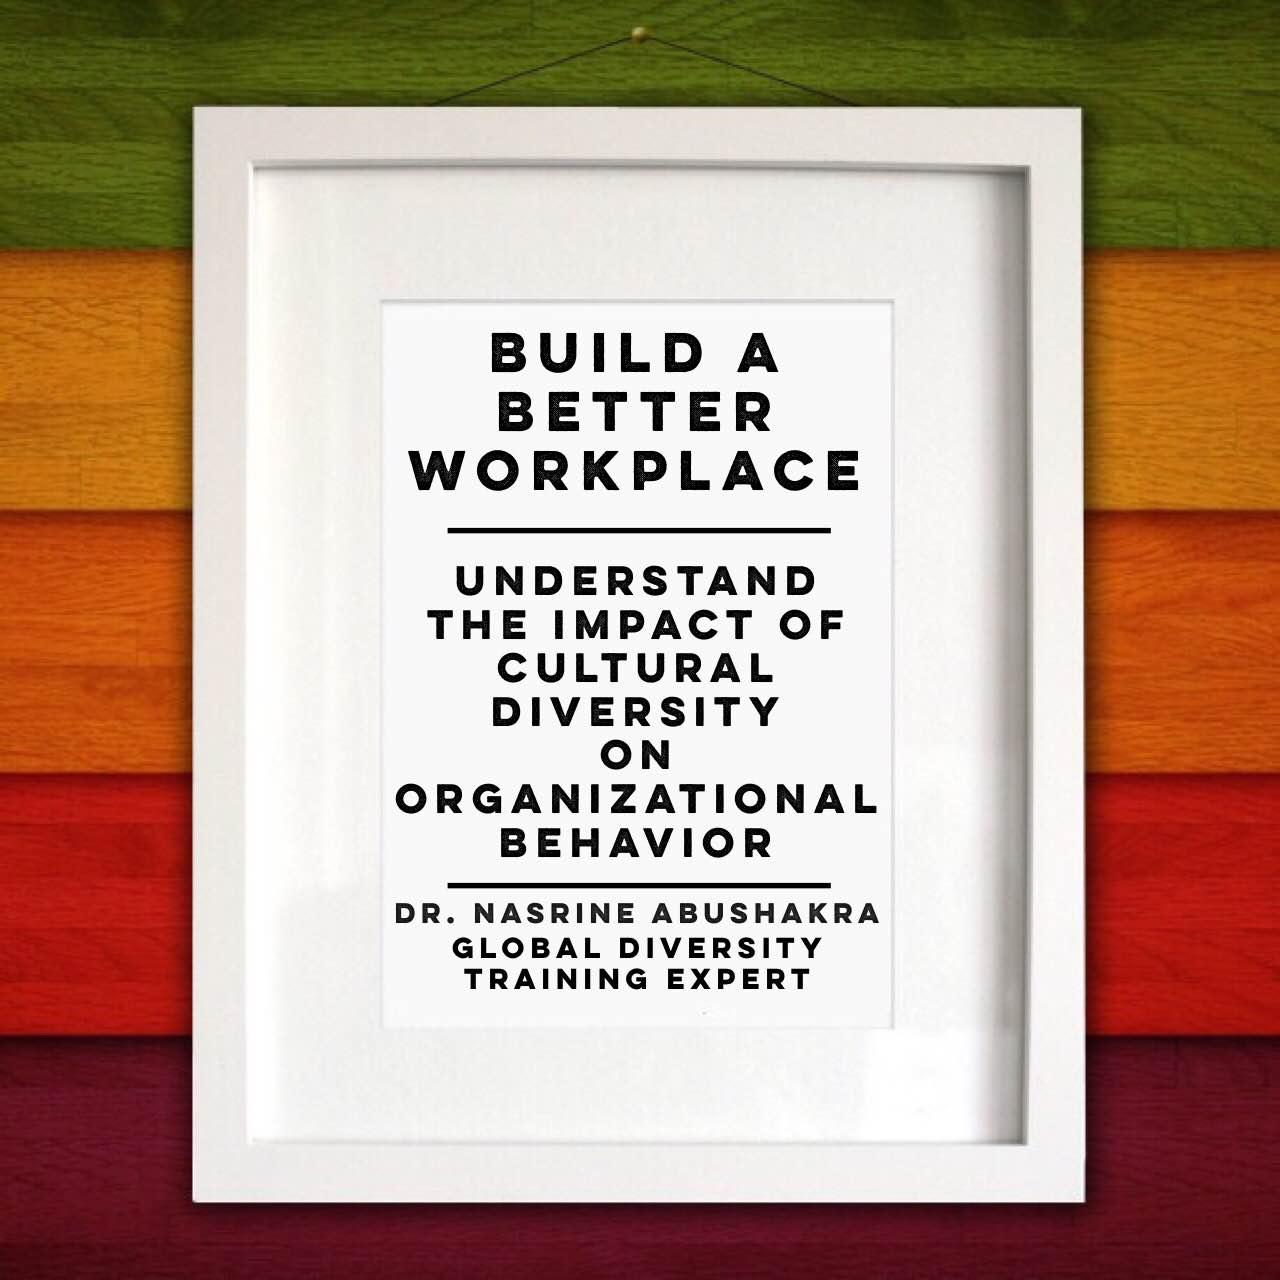 How Cultural Diversity Impacts Organizational Behavior